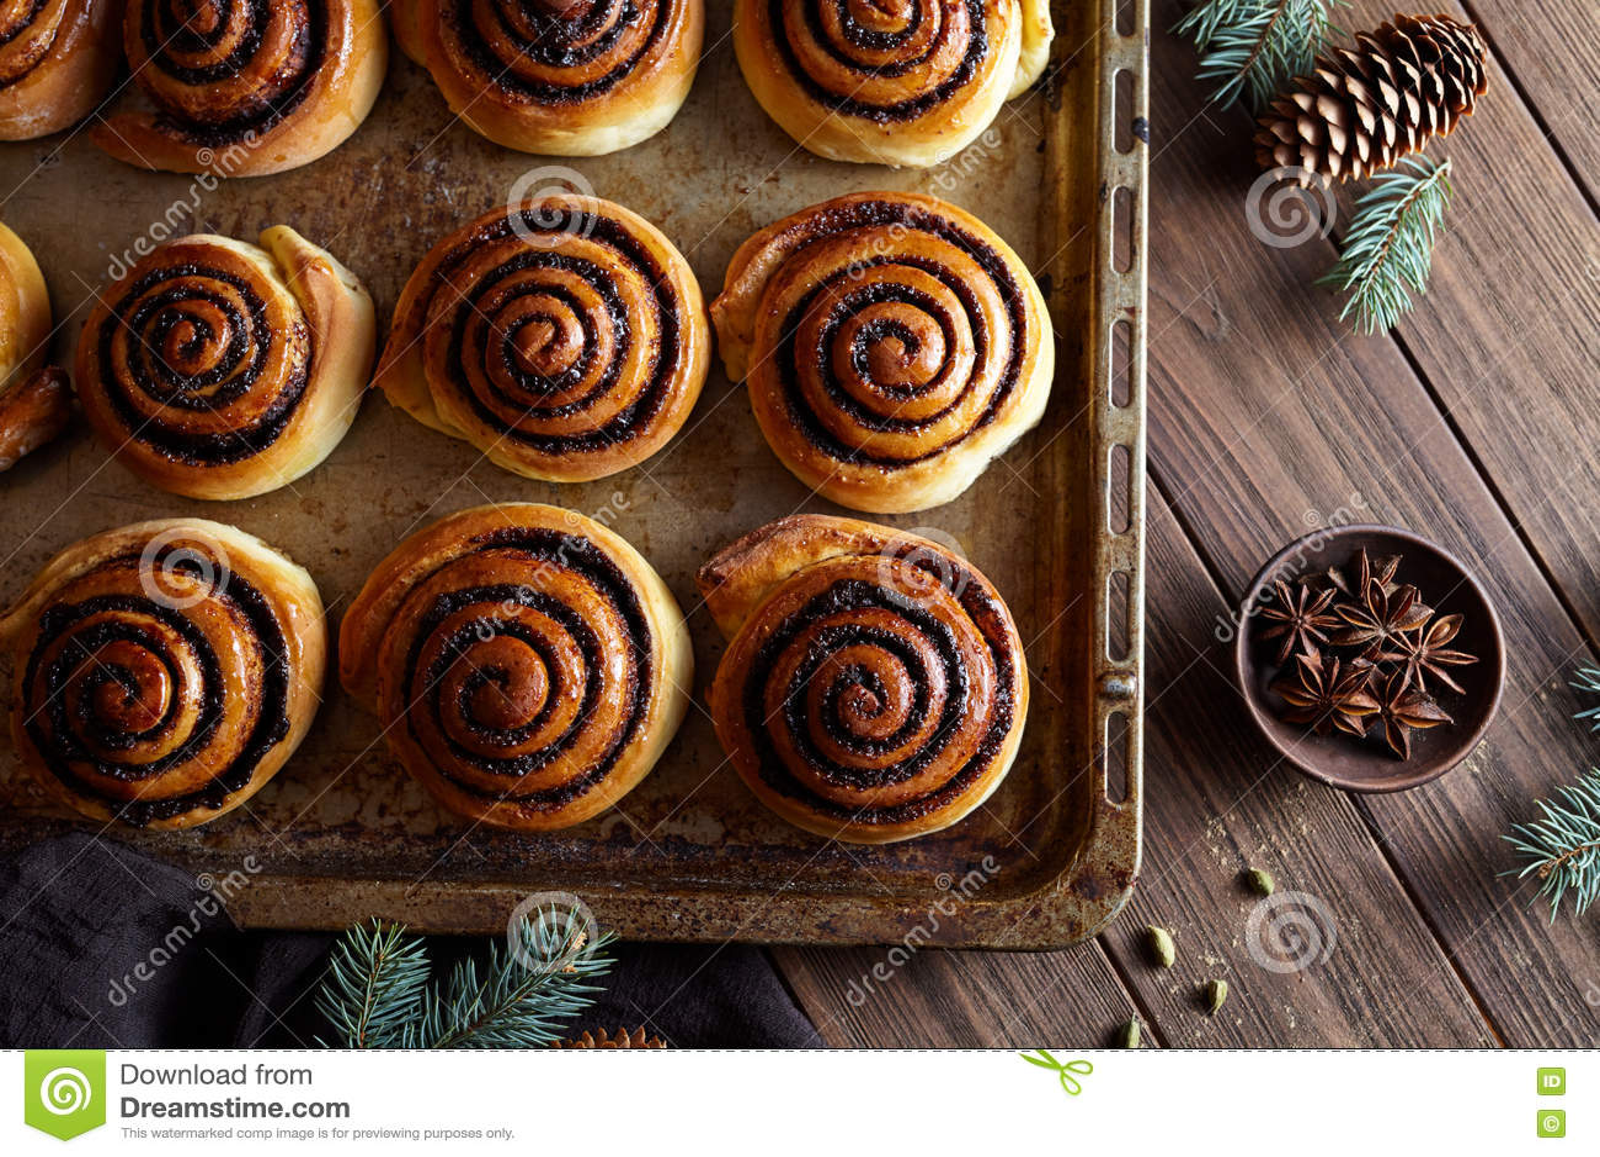 Swedish Christmas Bread.Sweet Homemade Christmas Baking Cinnamon Rolls Buns With Cocoa